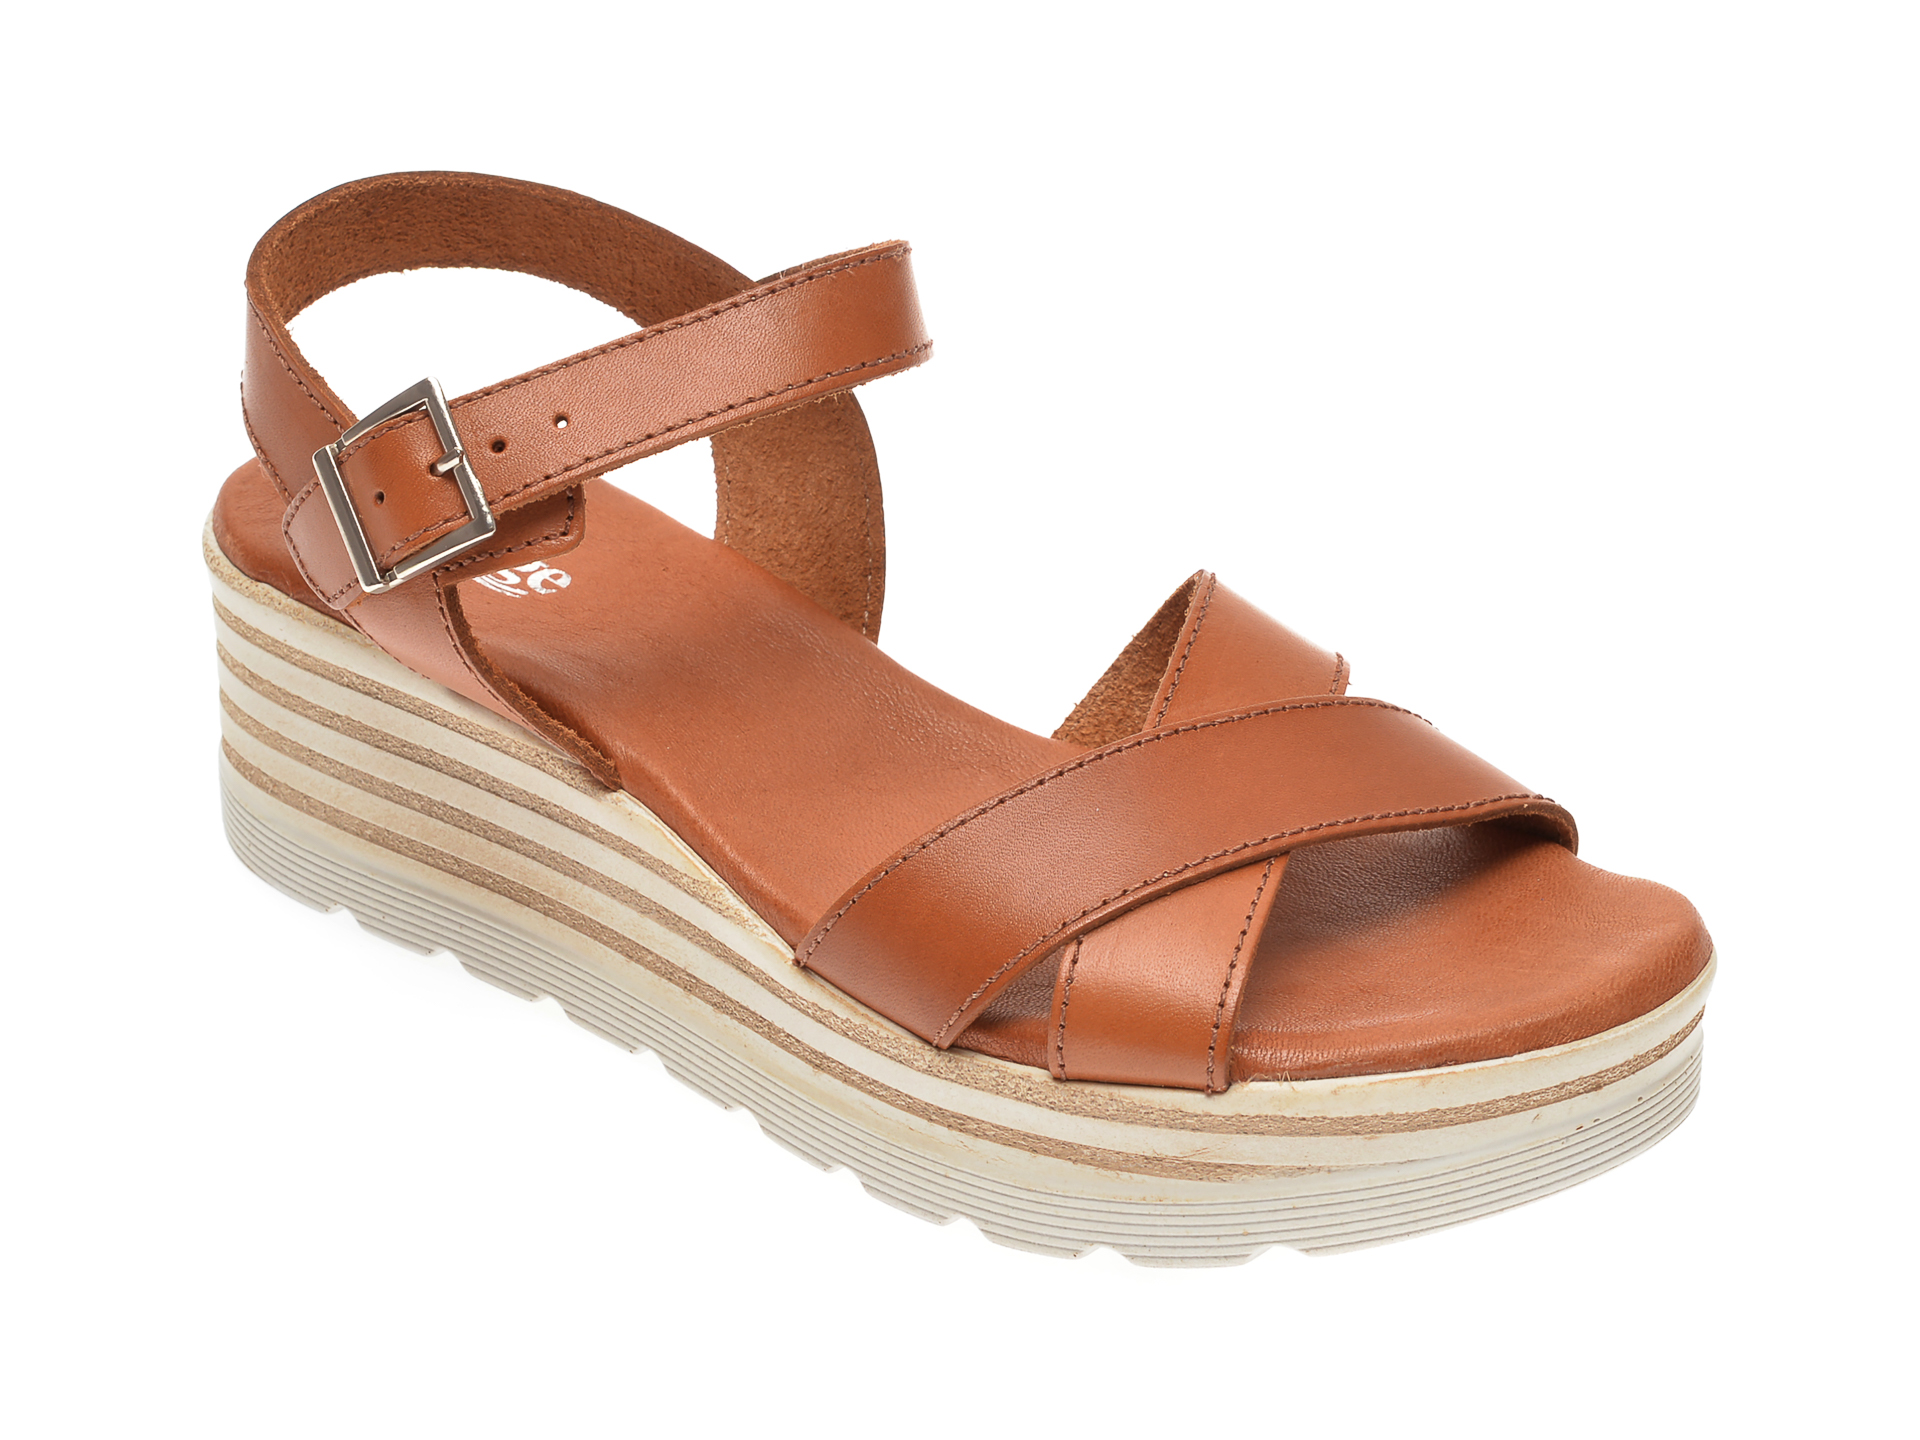 Sandale IMAGE maro, 8110, din piele naturala